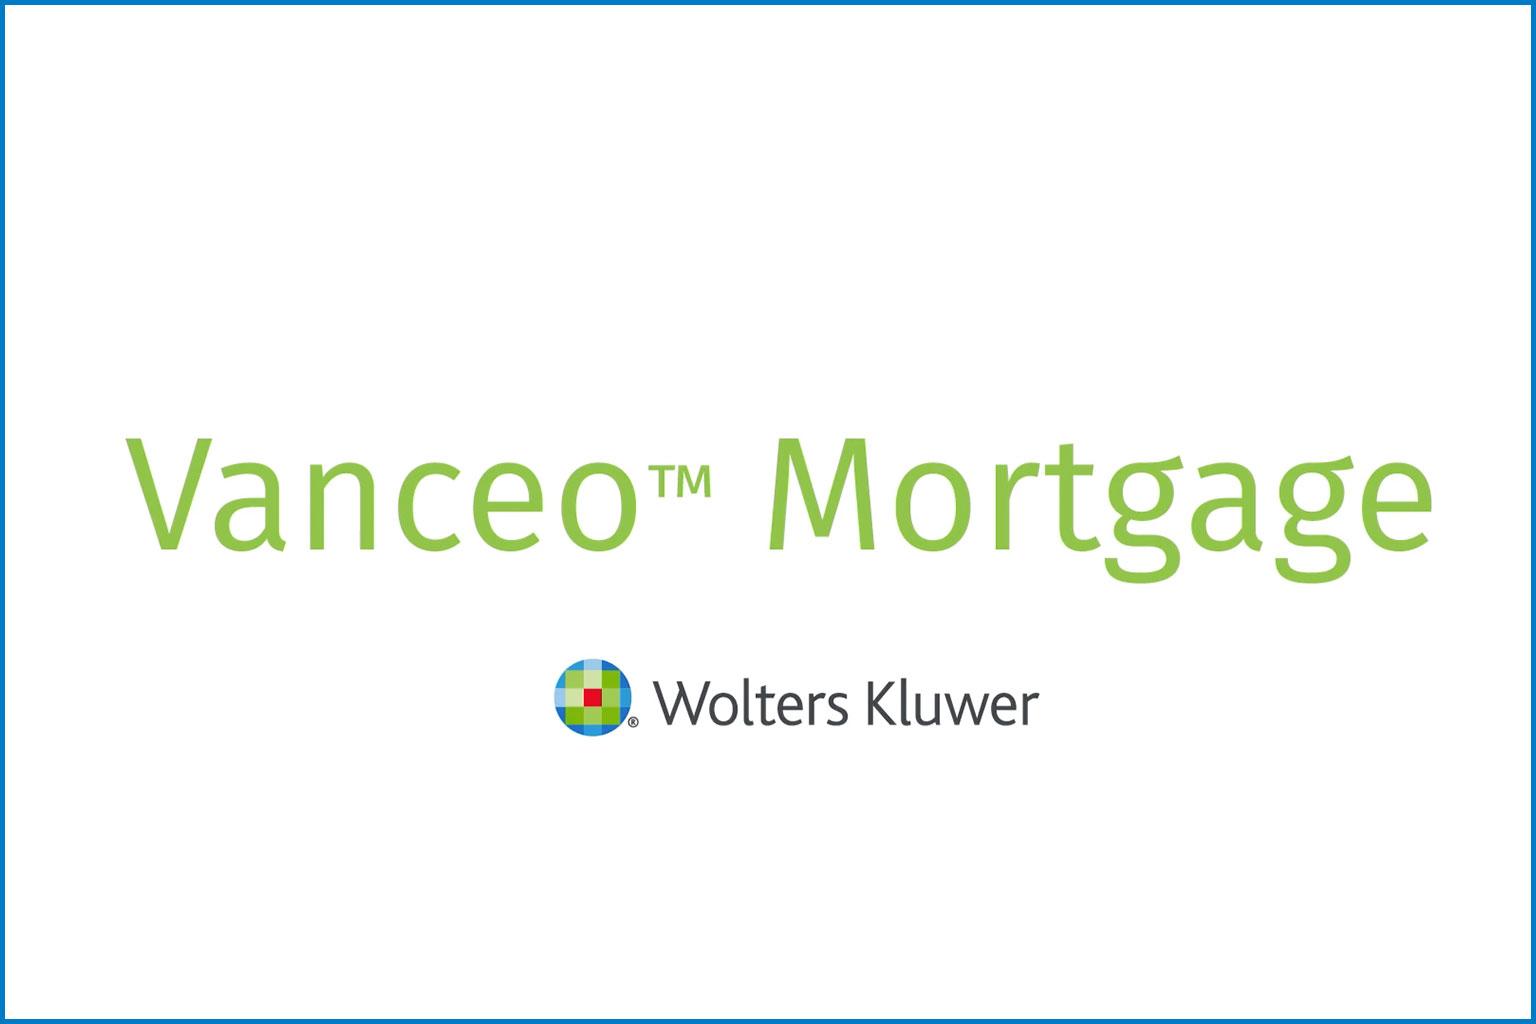 Vanceo Mortgage